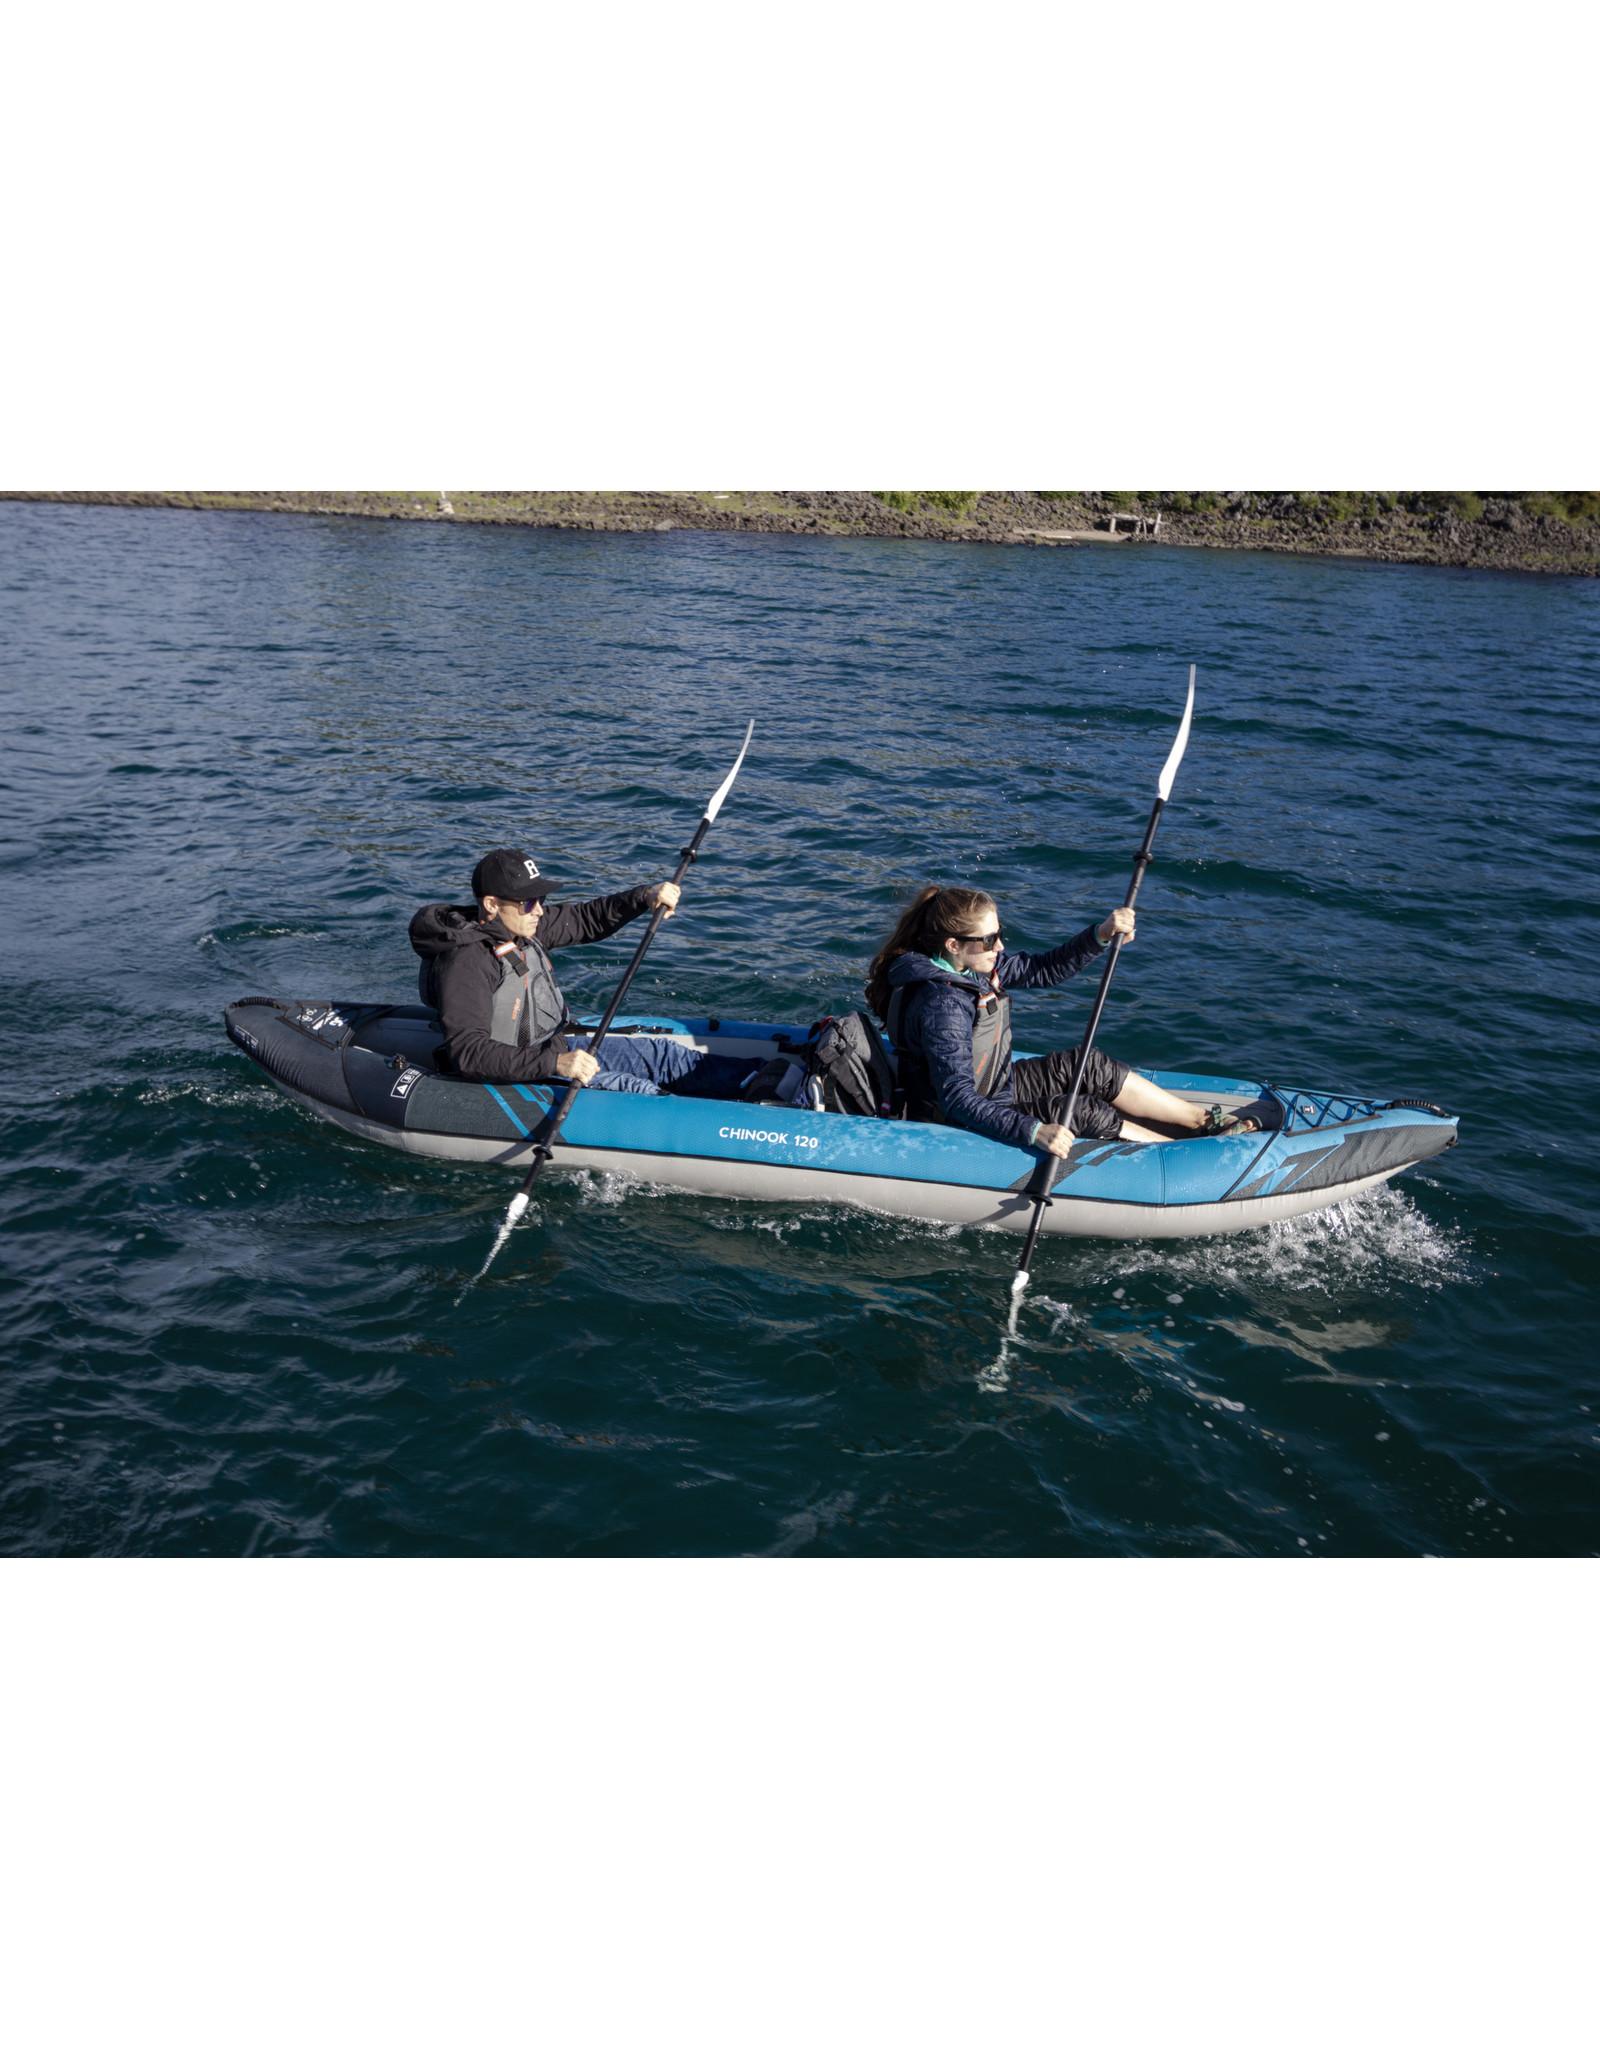 Aquaglide Chinook 120